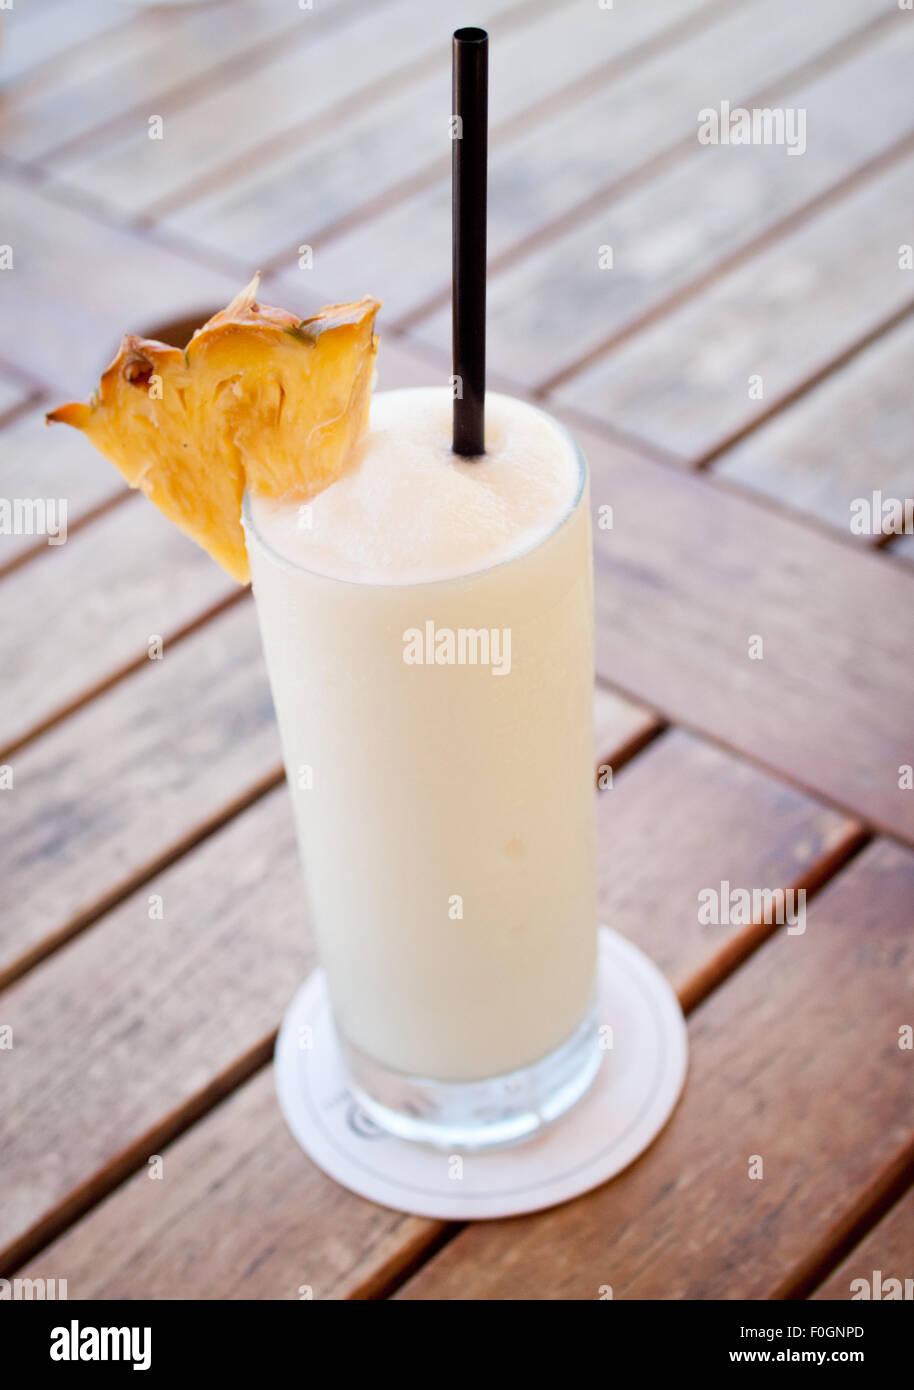 Une piña colada (pina colada) cocktail. Photo Stock